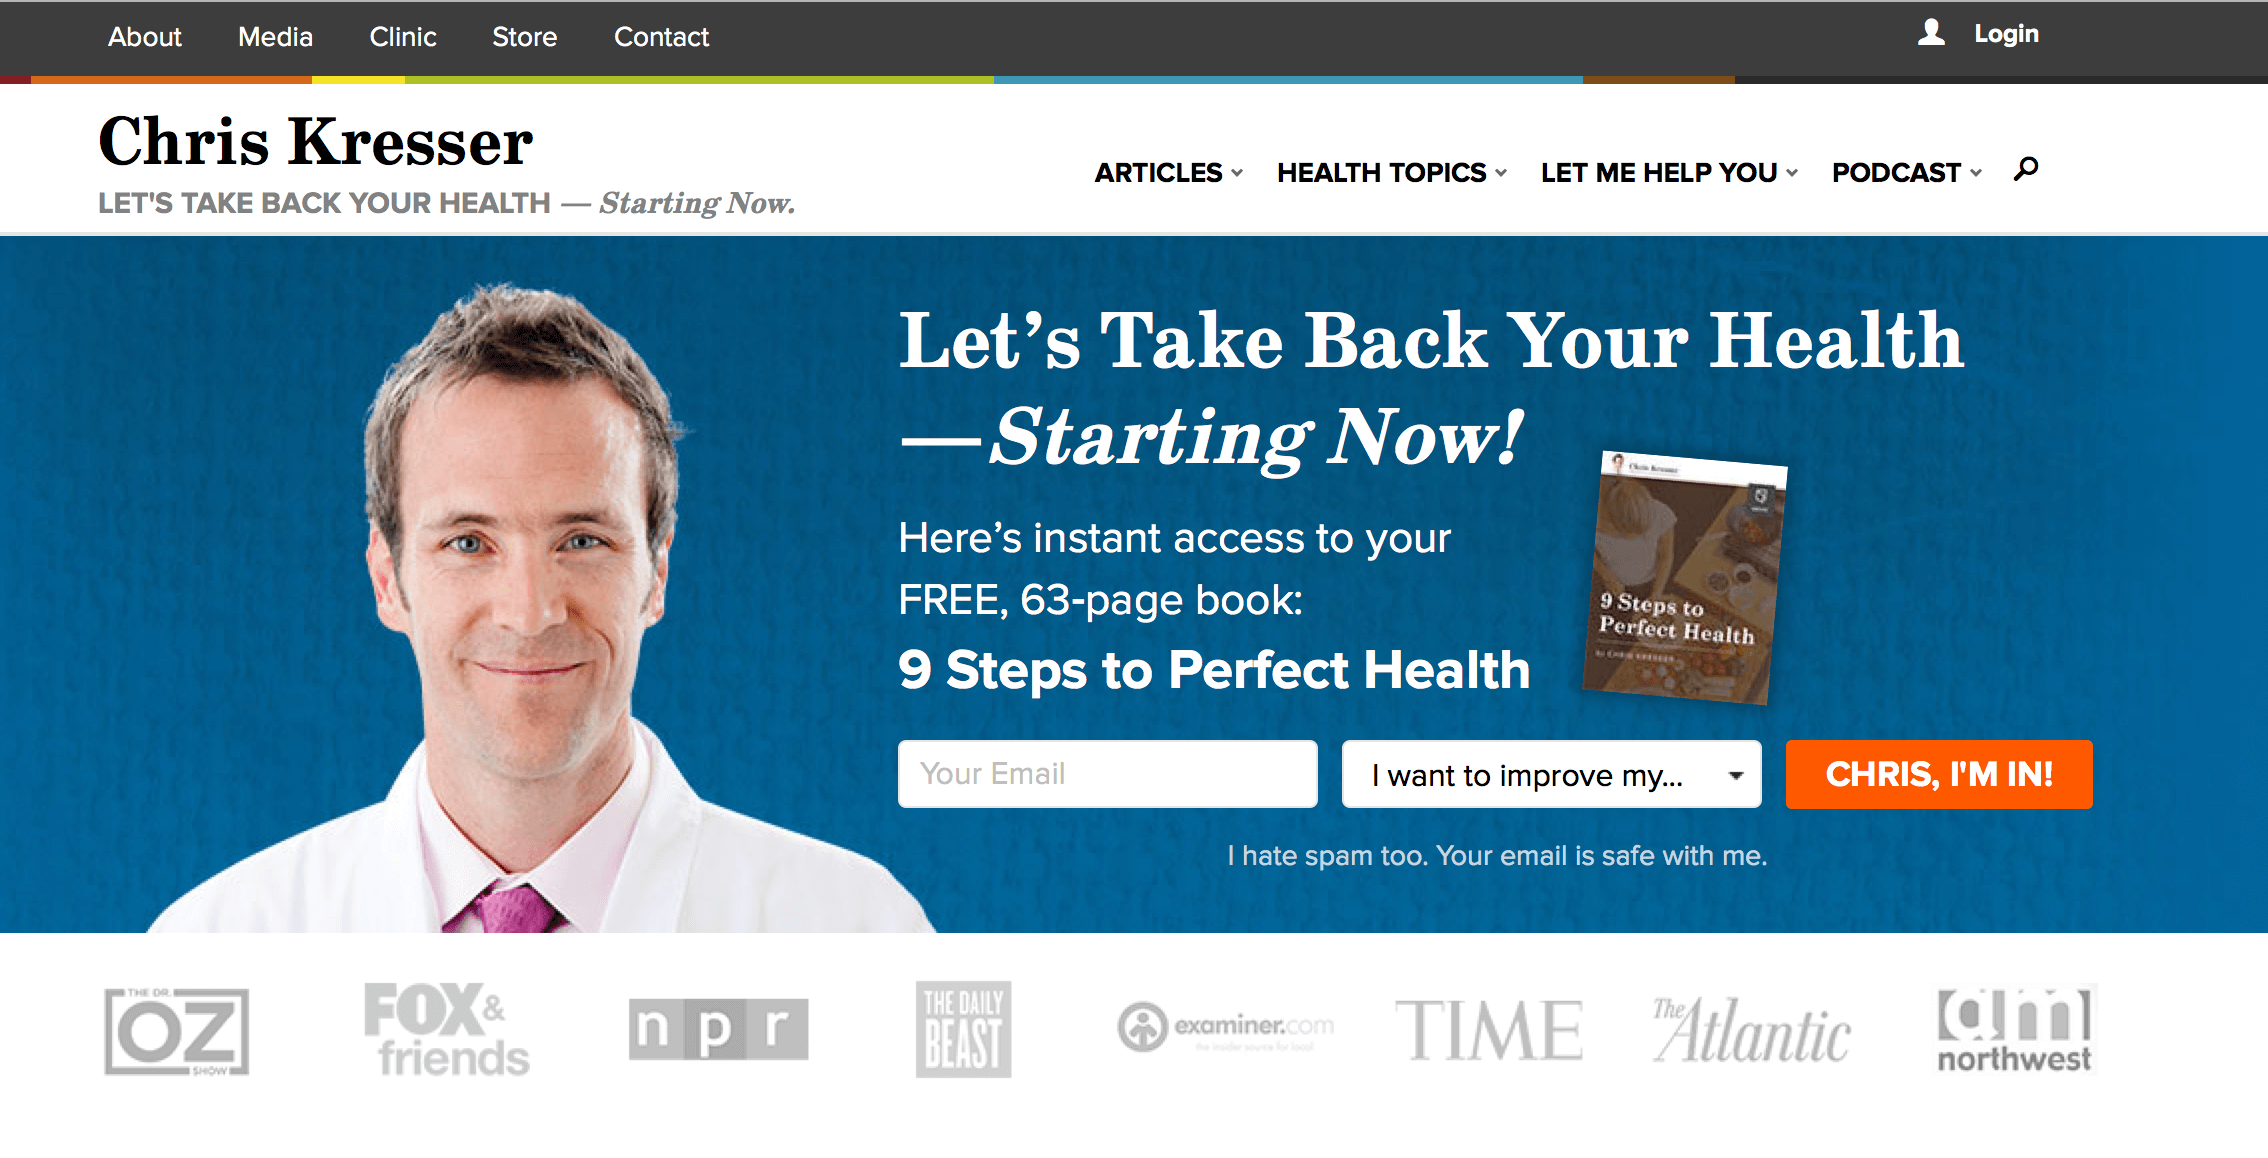 Chris Kresser website image